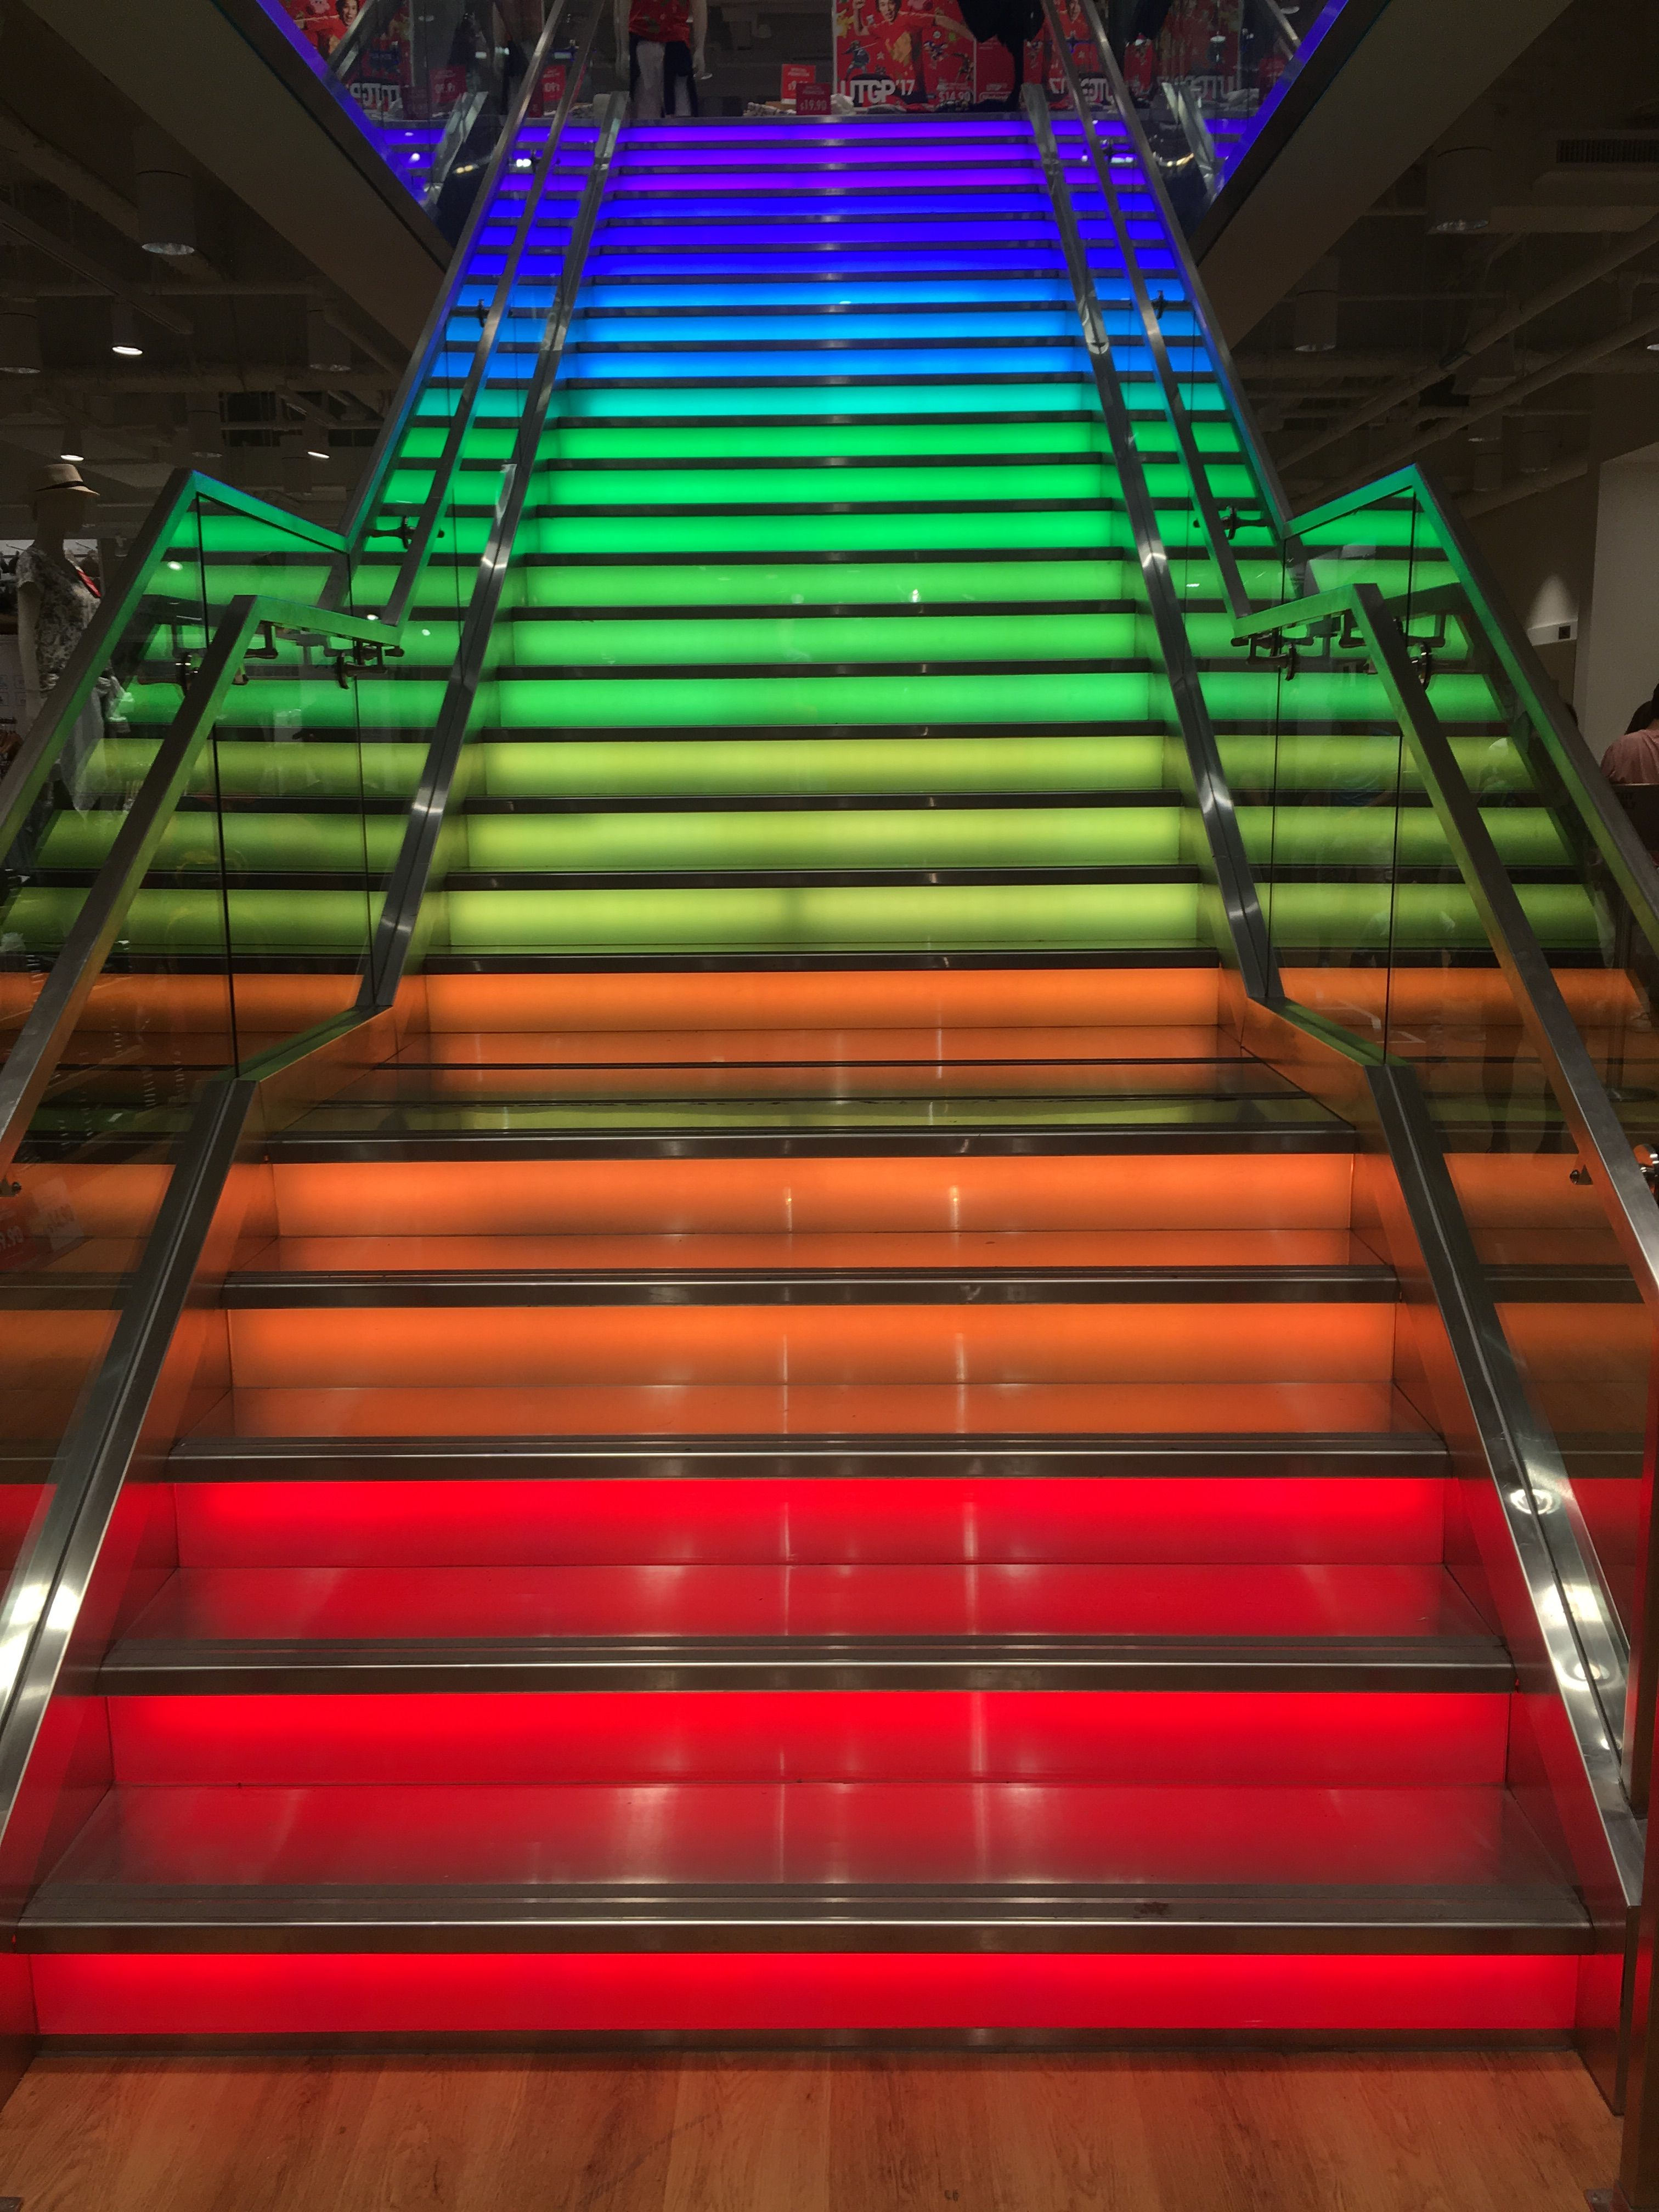 Lighting Basement Washroom Stairs: Uniqlo's Unique Rainbow Staircase Located At Newbury